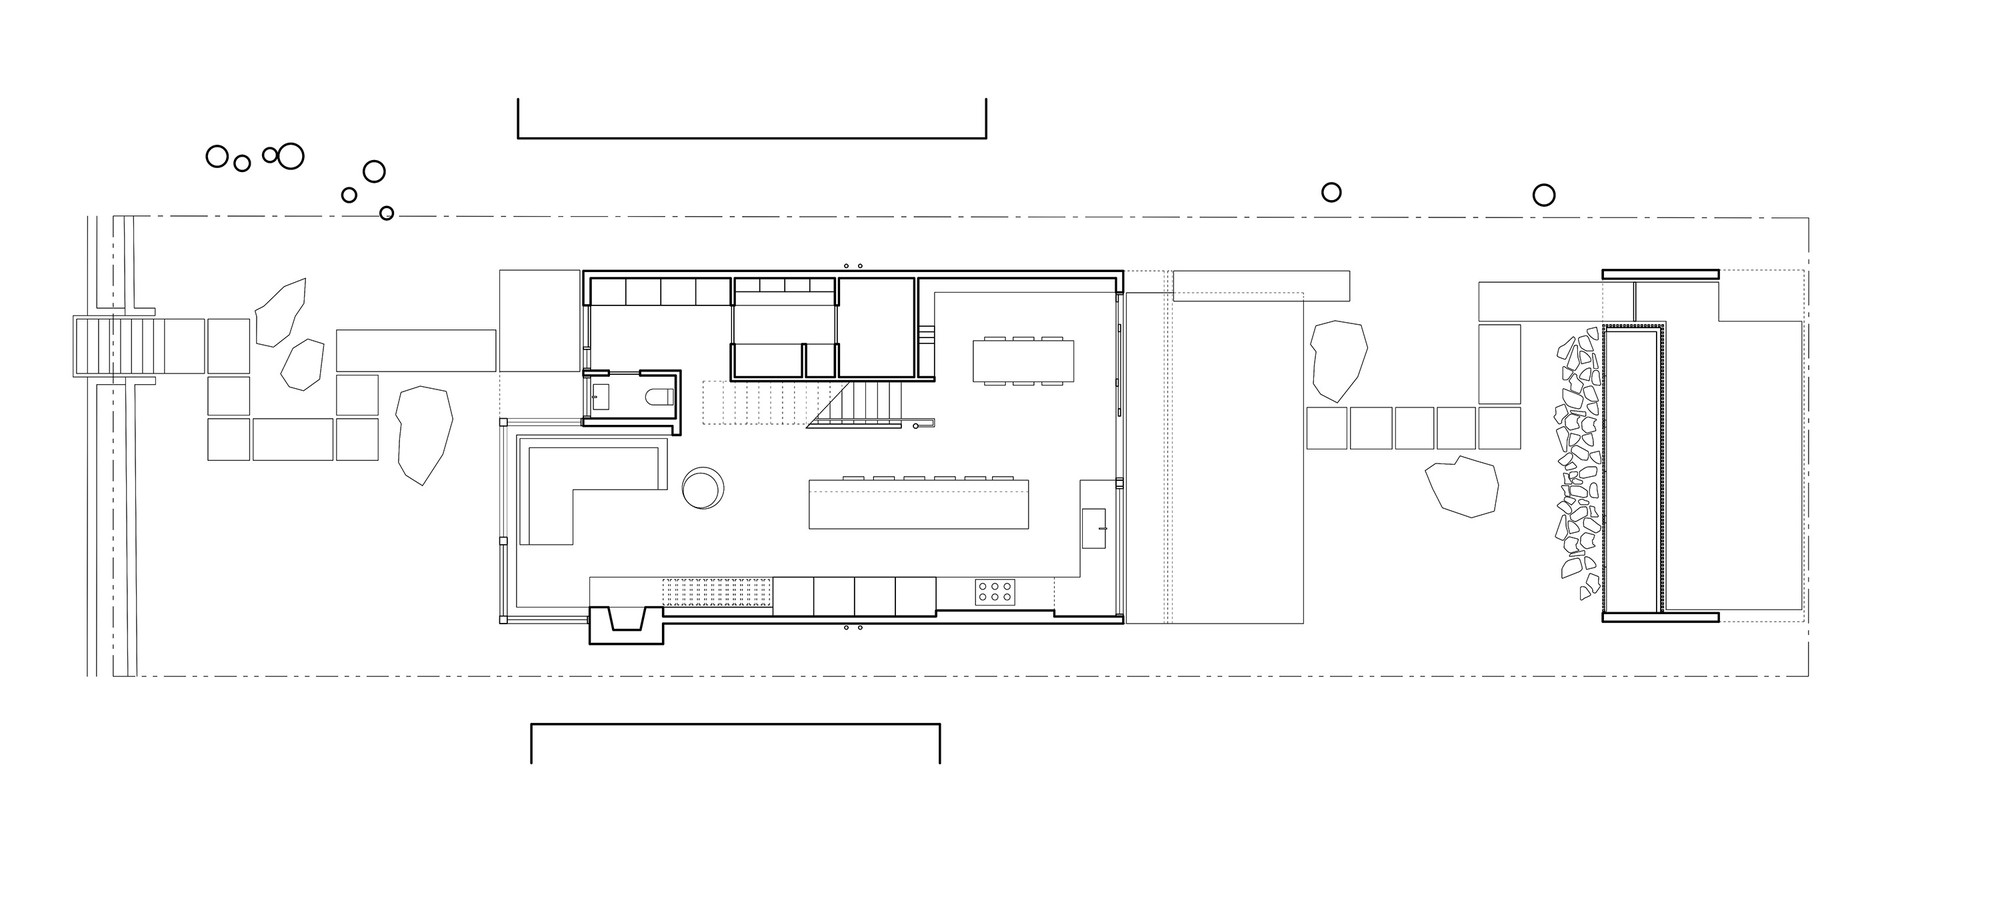 430 House,Ground Floor Plan